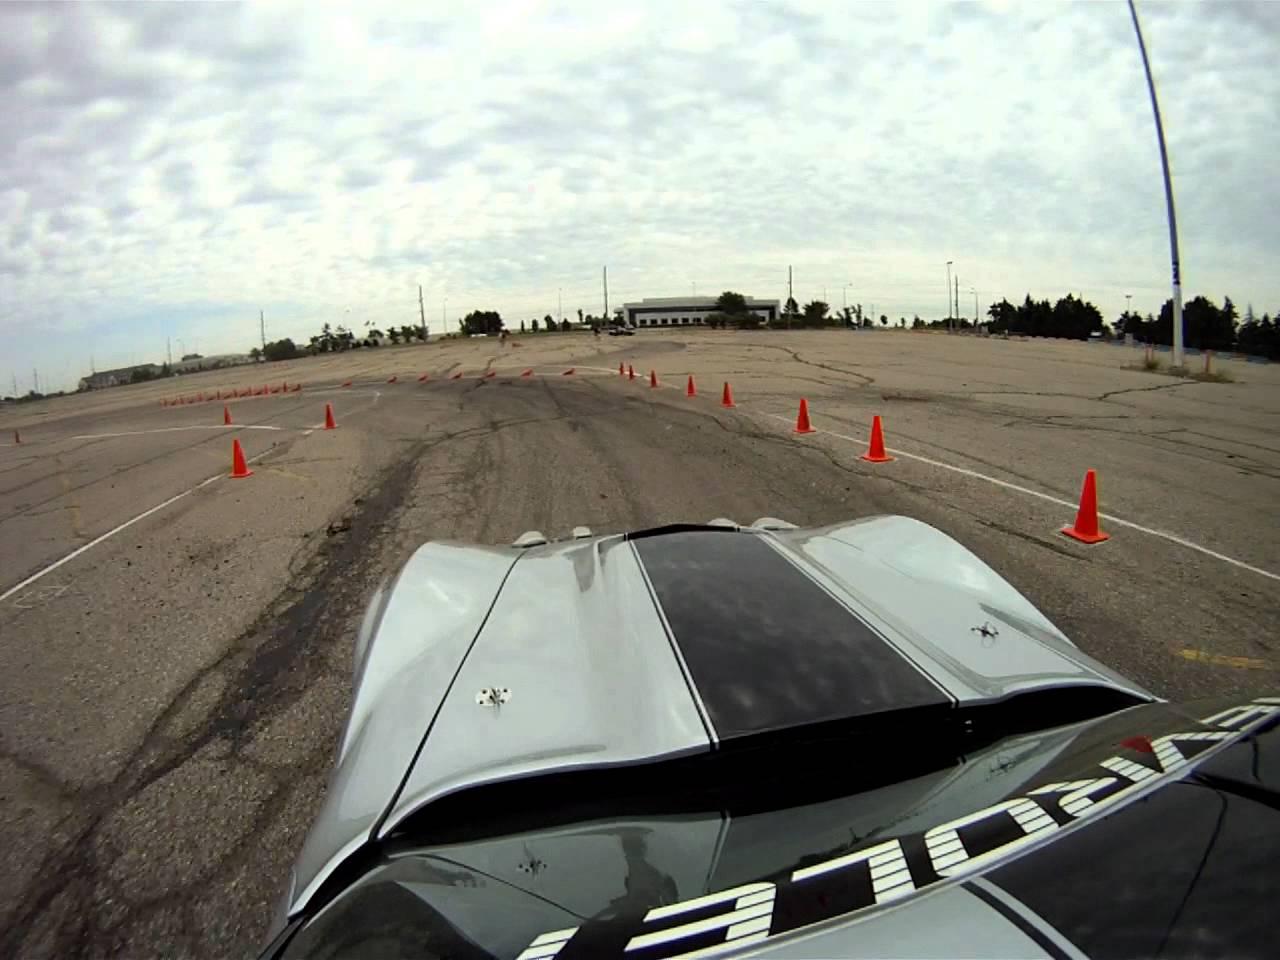 Detroit SCCA – 6/24/12 @ Pontiac Silverdome – Prepared C3 Corvette